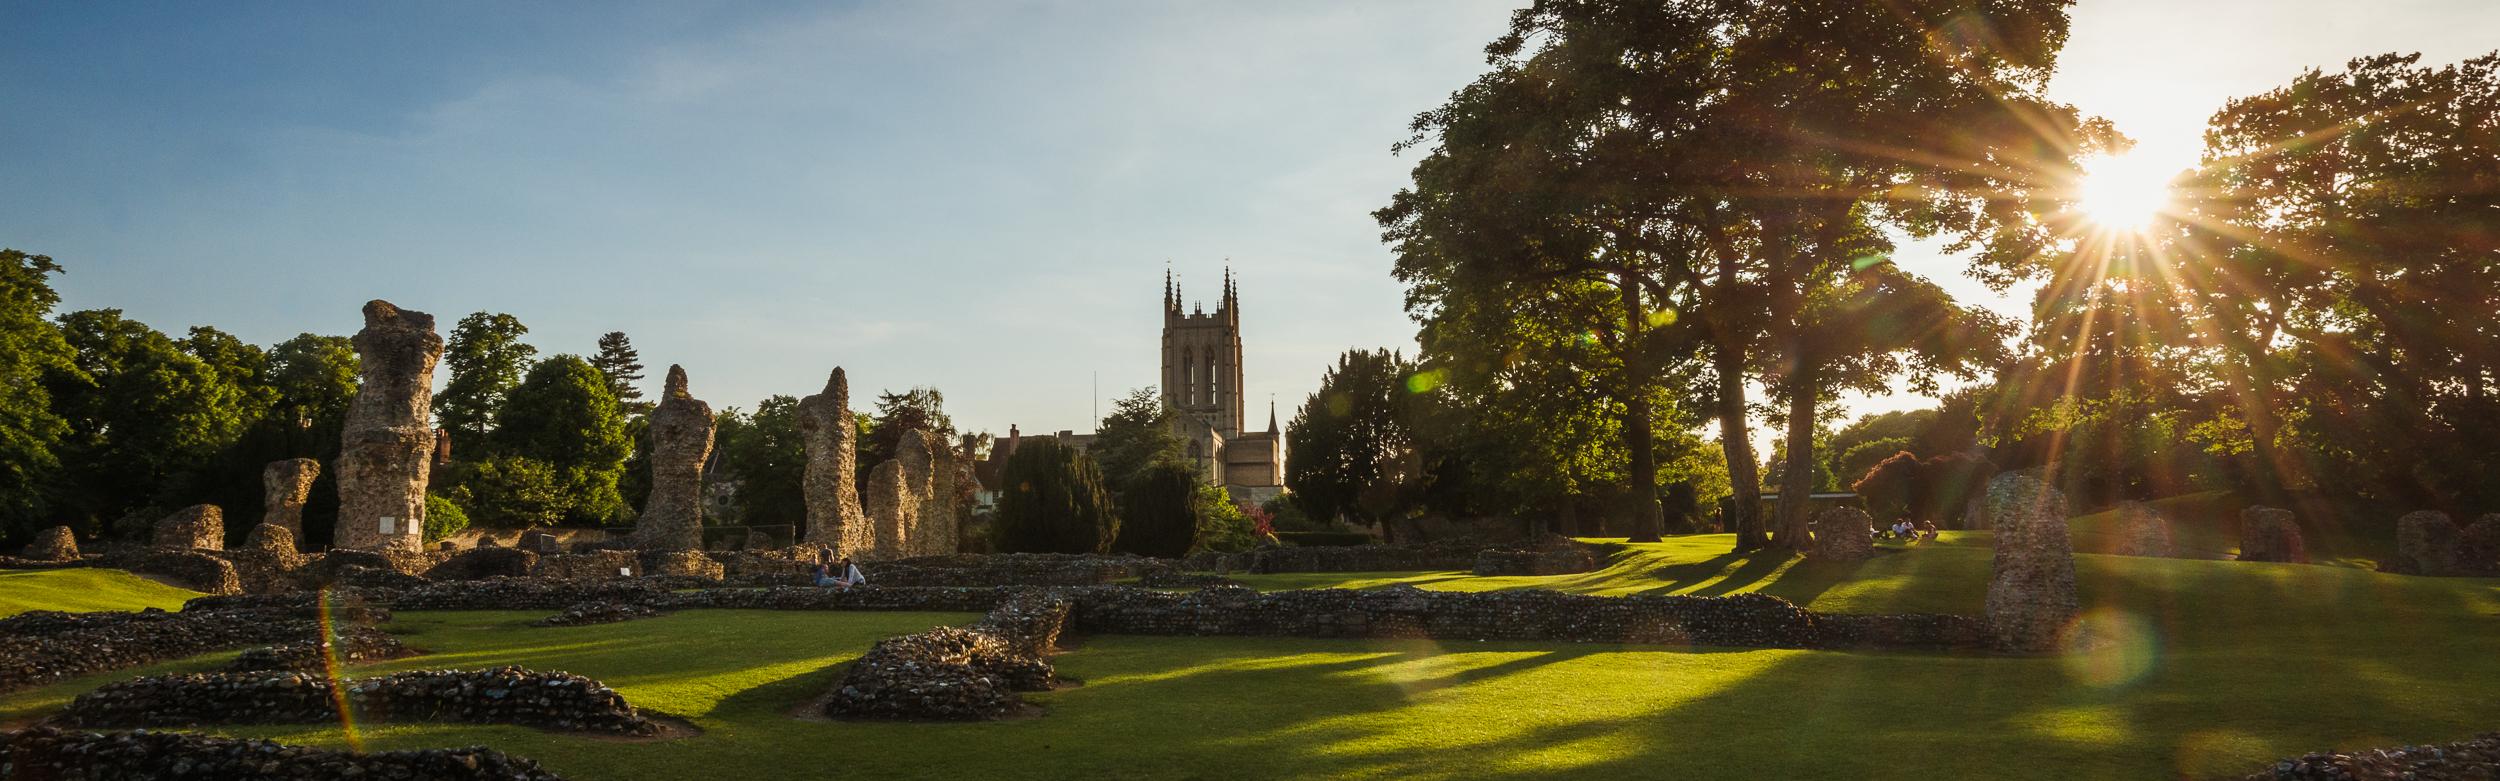 Abbey Gardens One